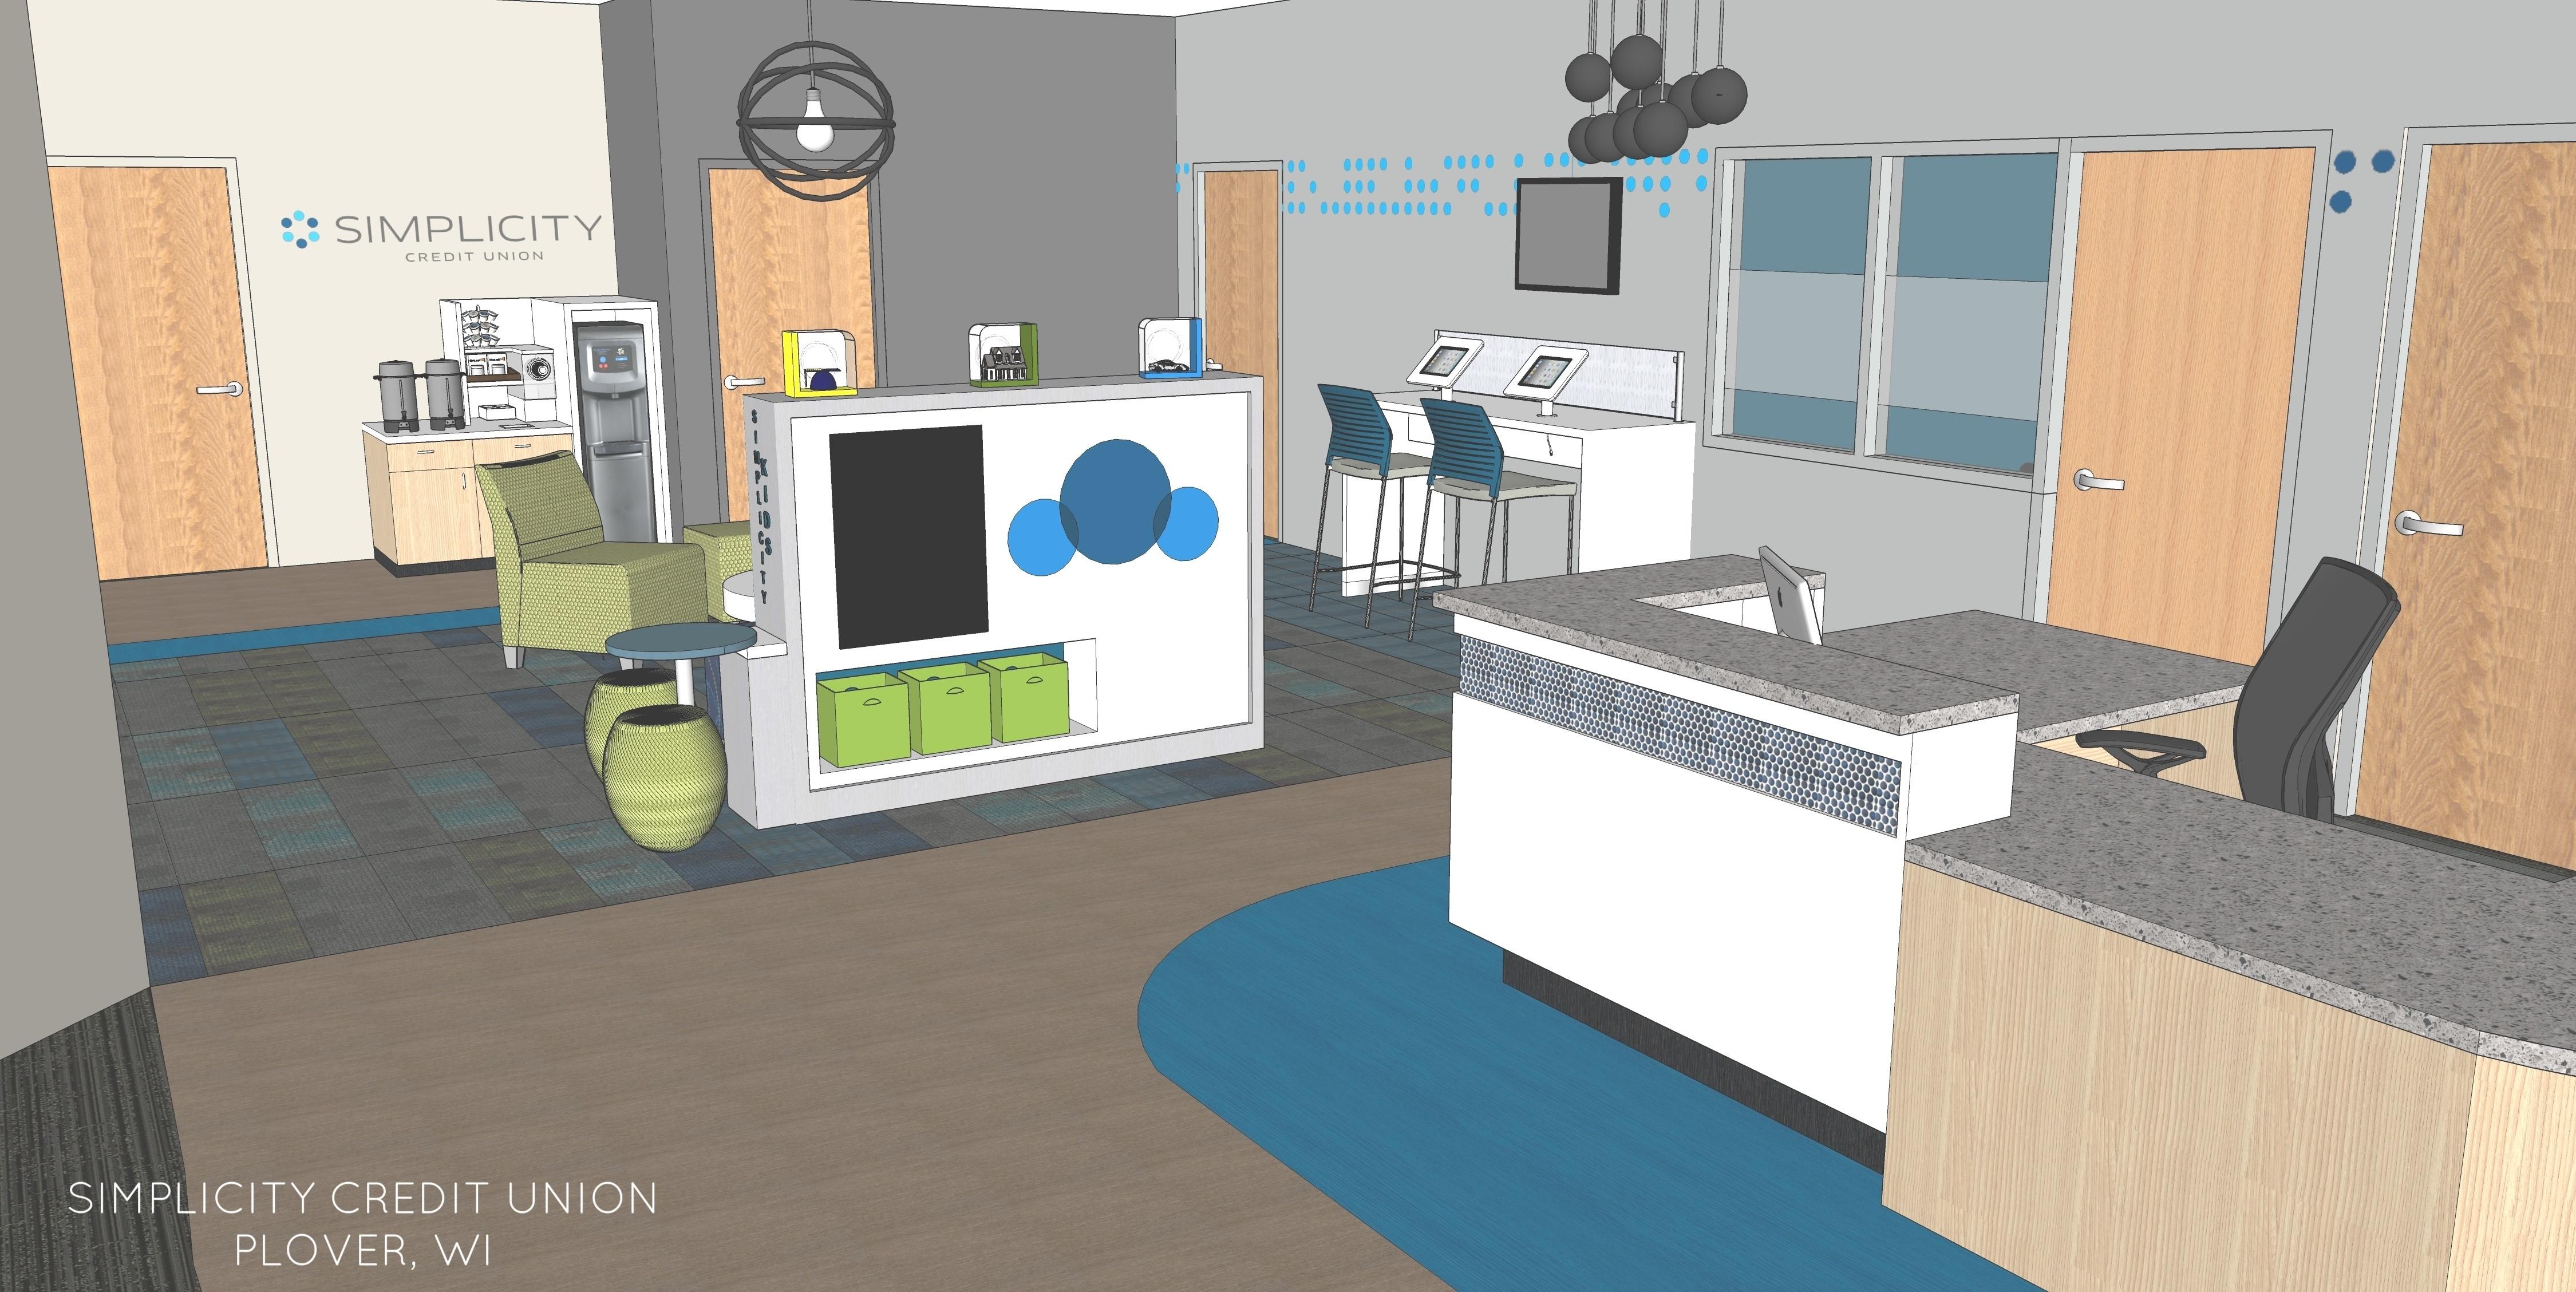 lobby-161847-edited.jpg